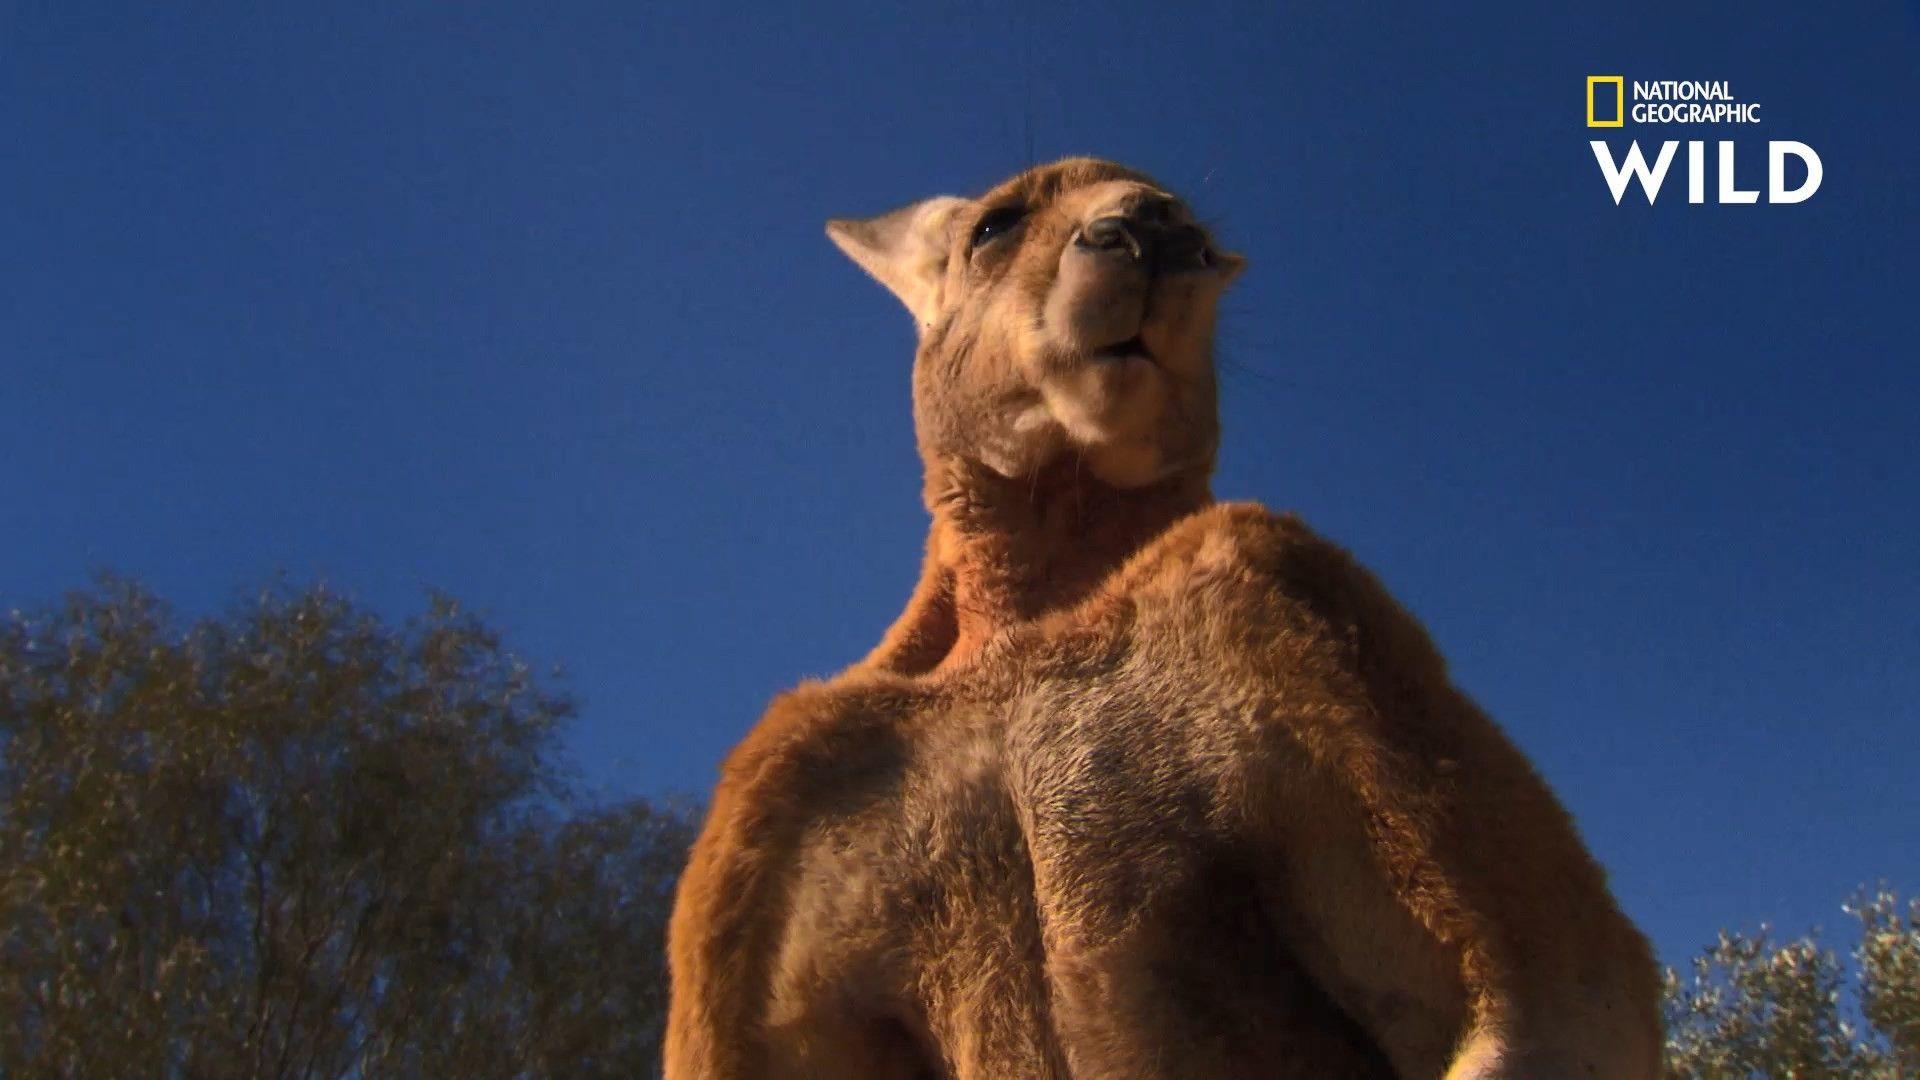 Le kangourou roux, bagarreur dans l'âme